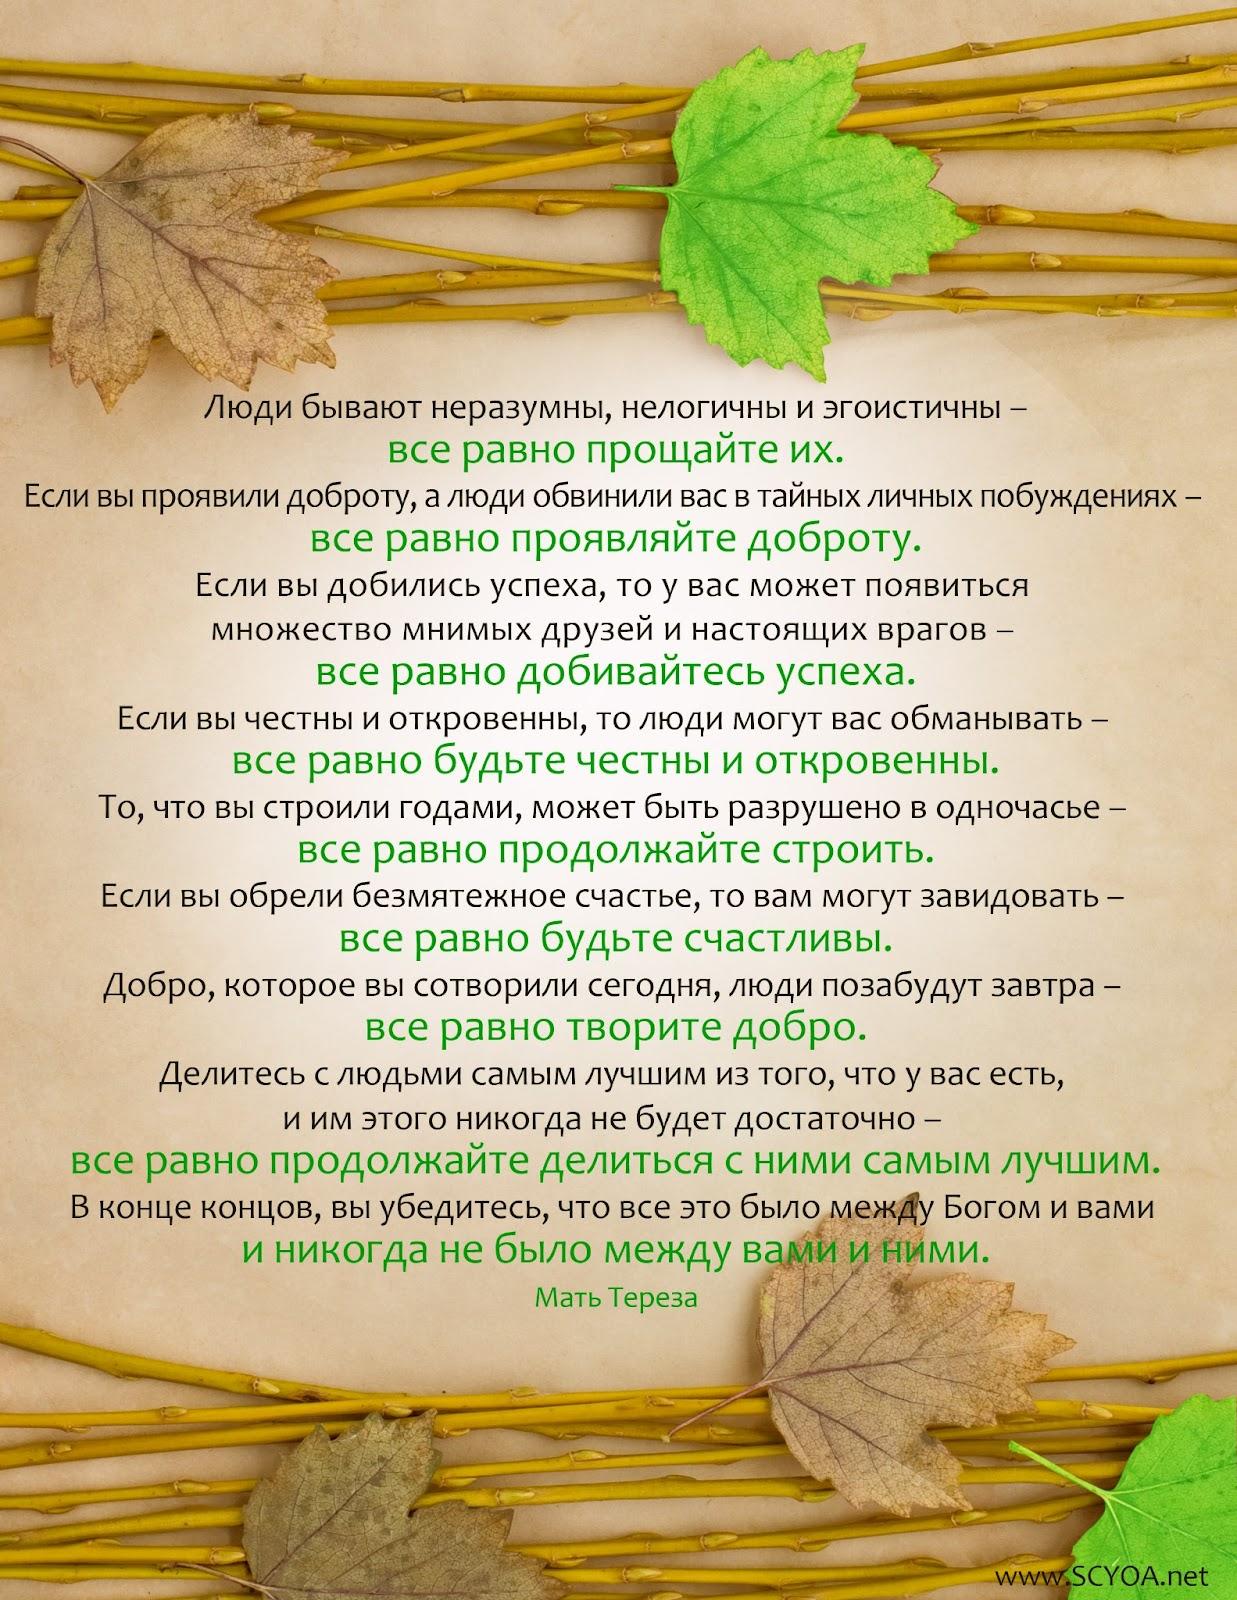 10 заповедей Матери Терезы рекомендации